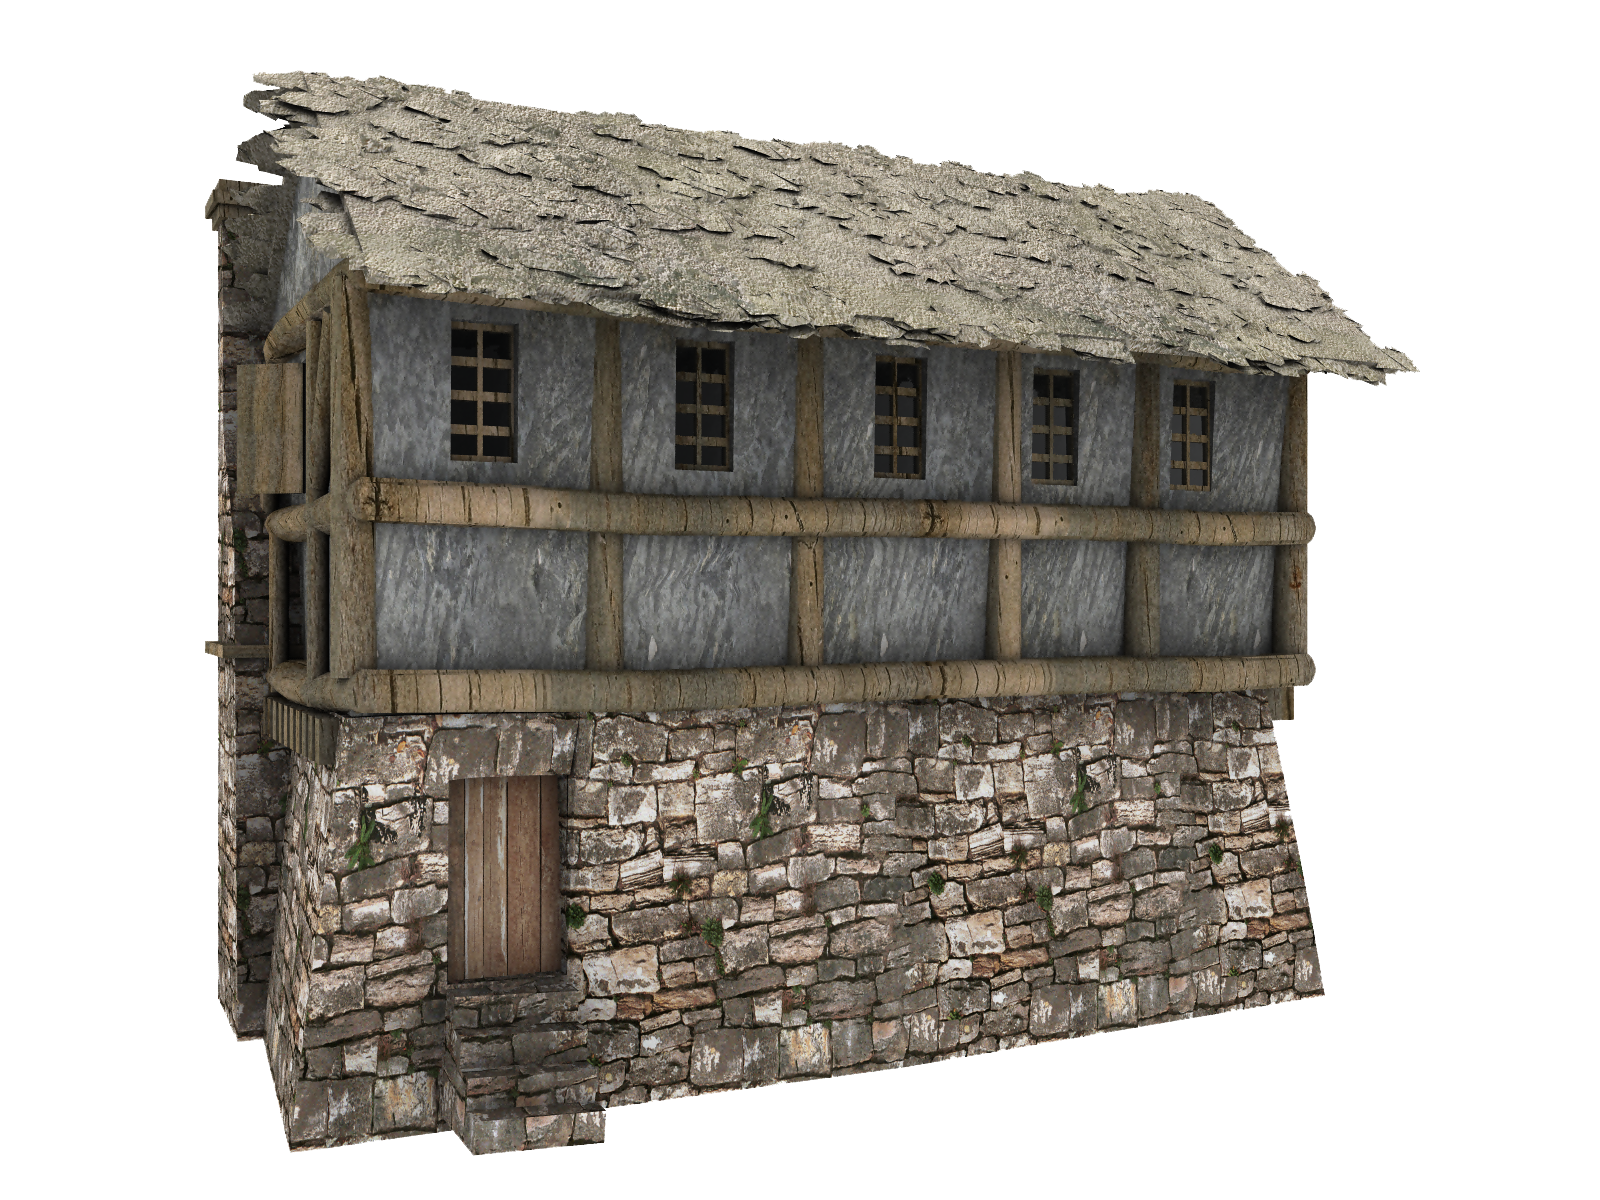 Cottage clipart cottage village. Medieval house transparent clipground